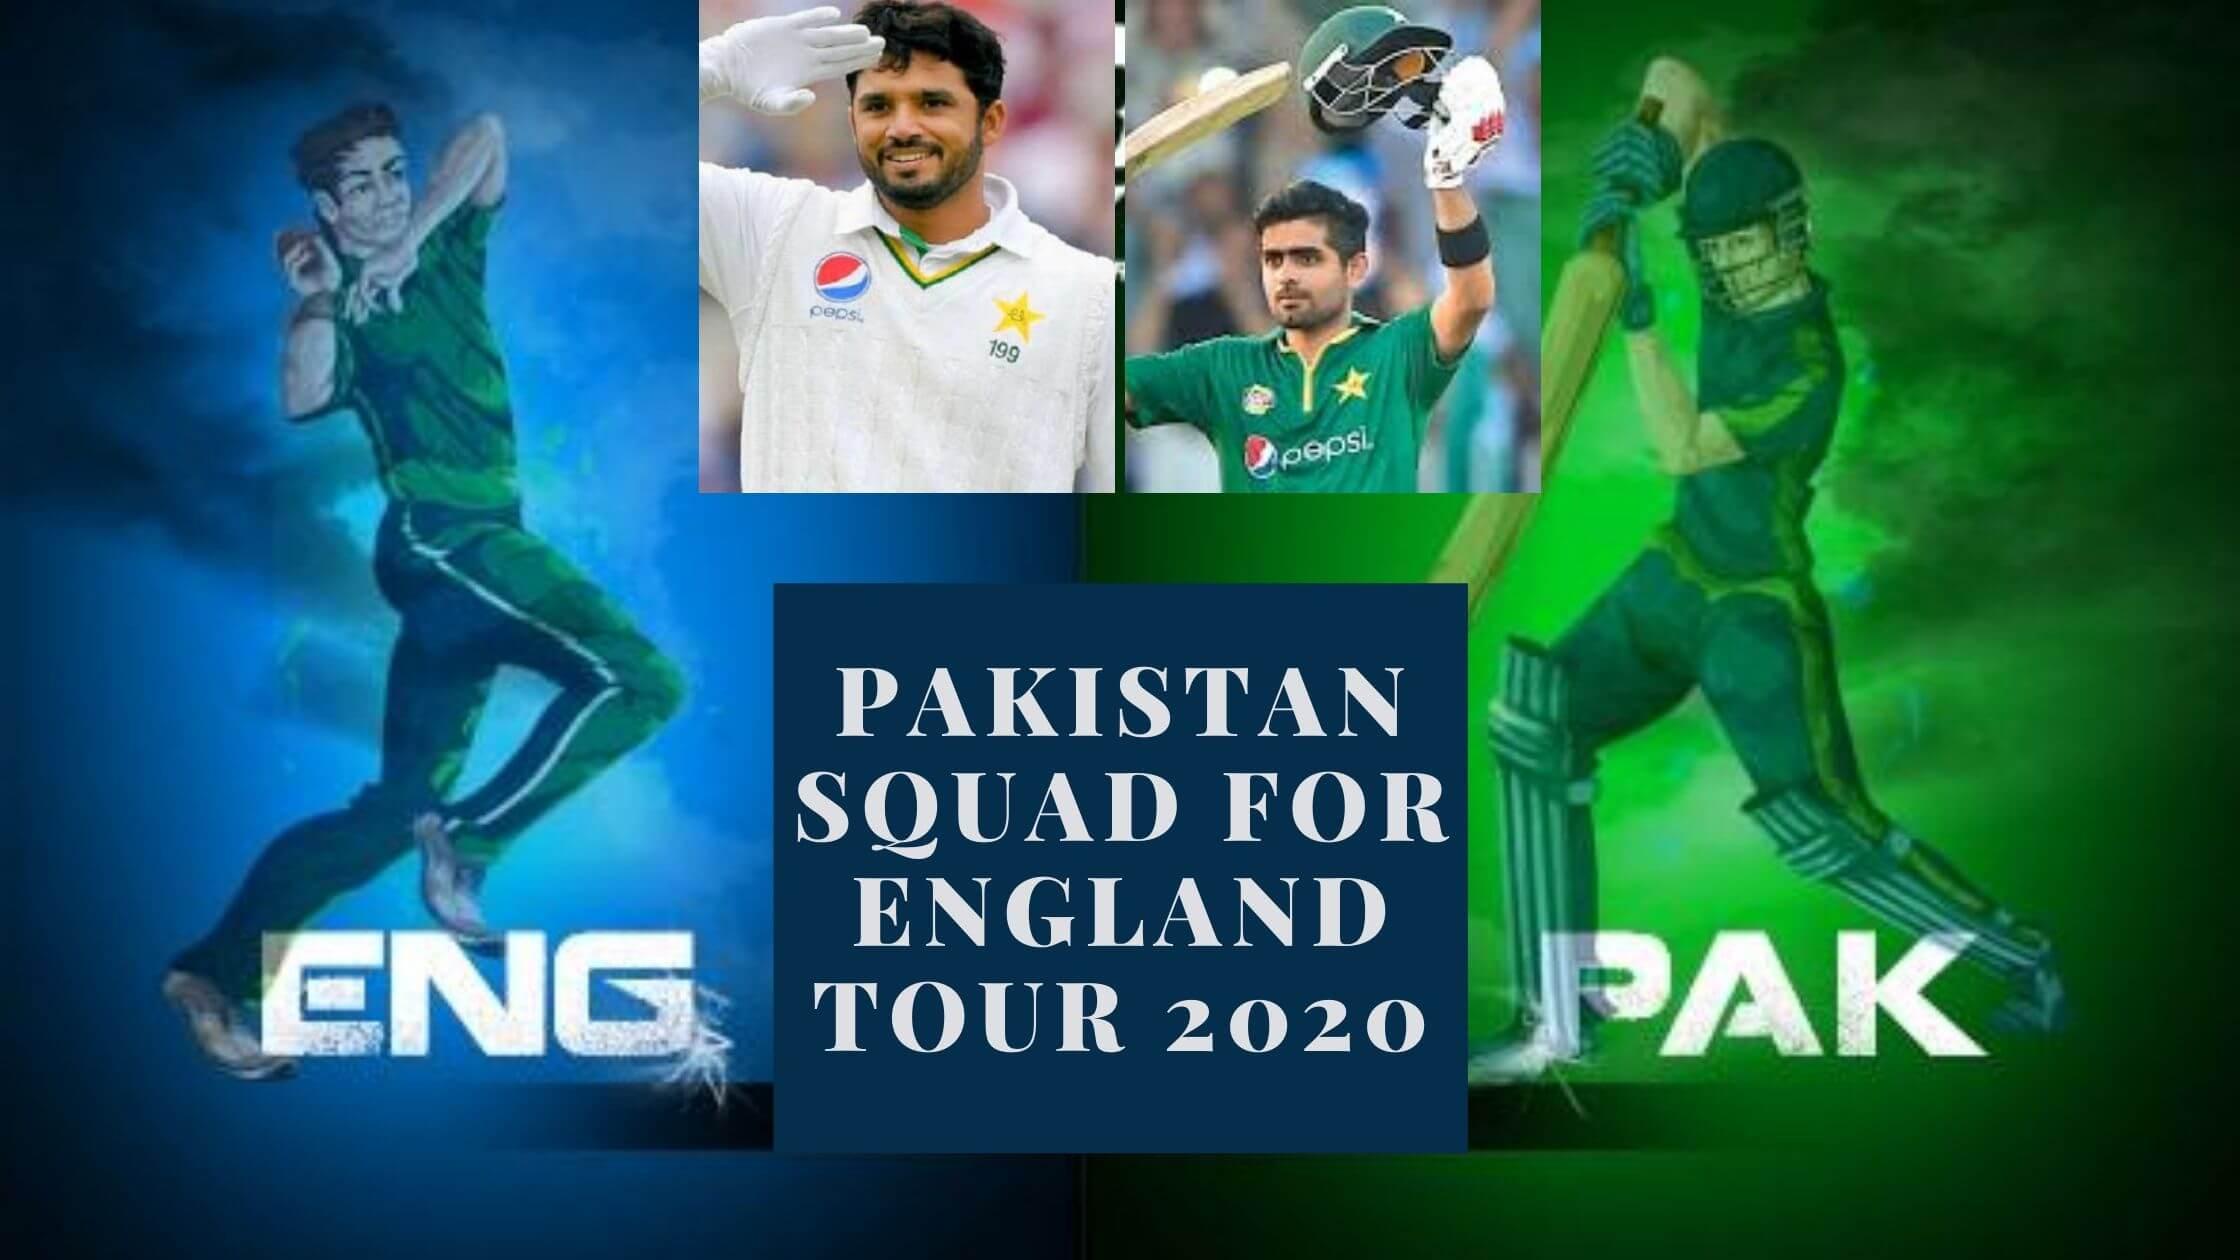 Pakistan Squad for England Tour 2020